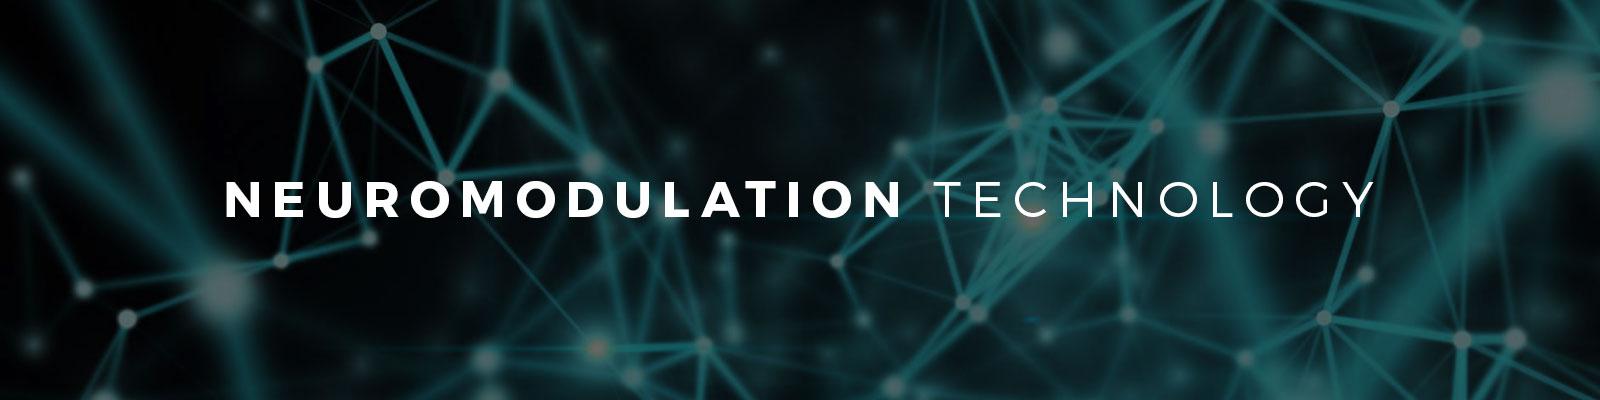 Neuromodulation Technology UK